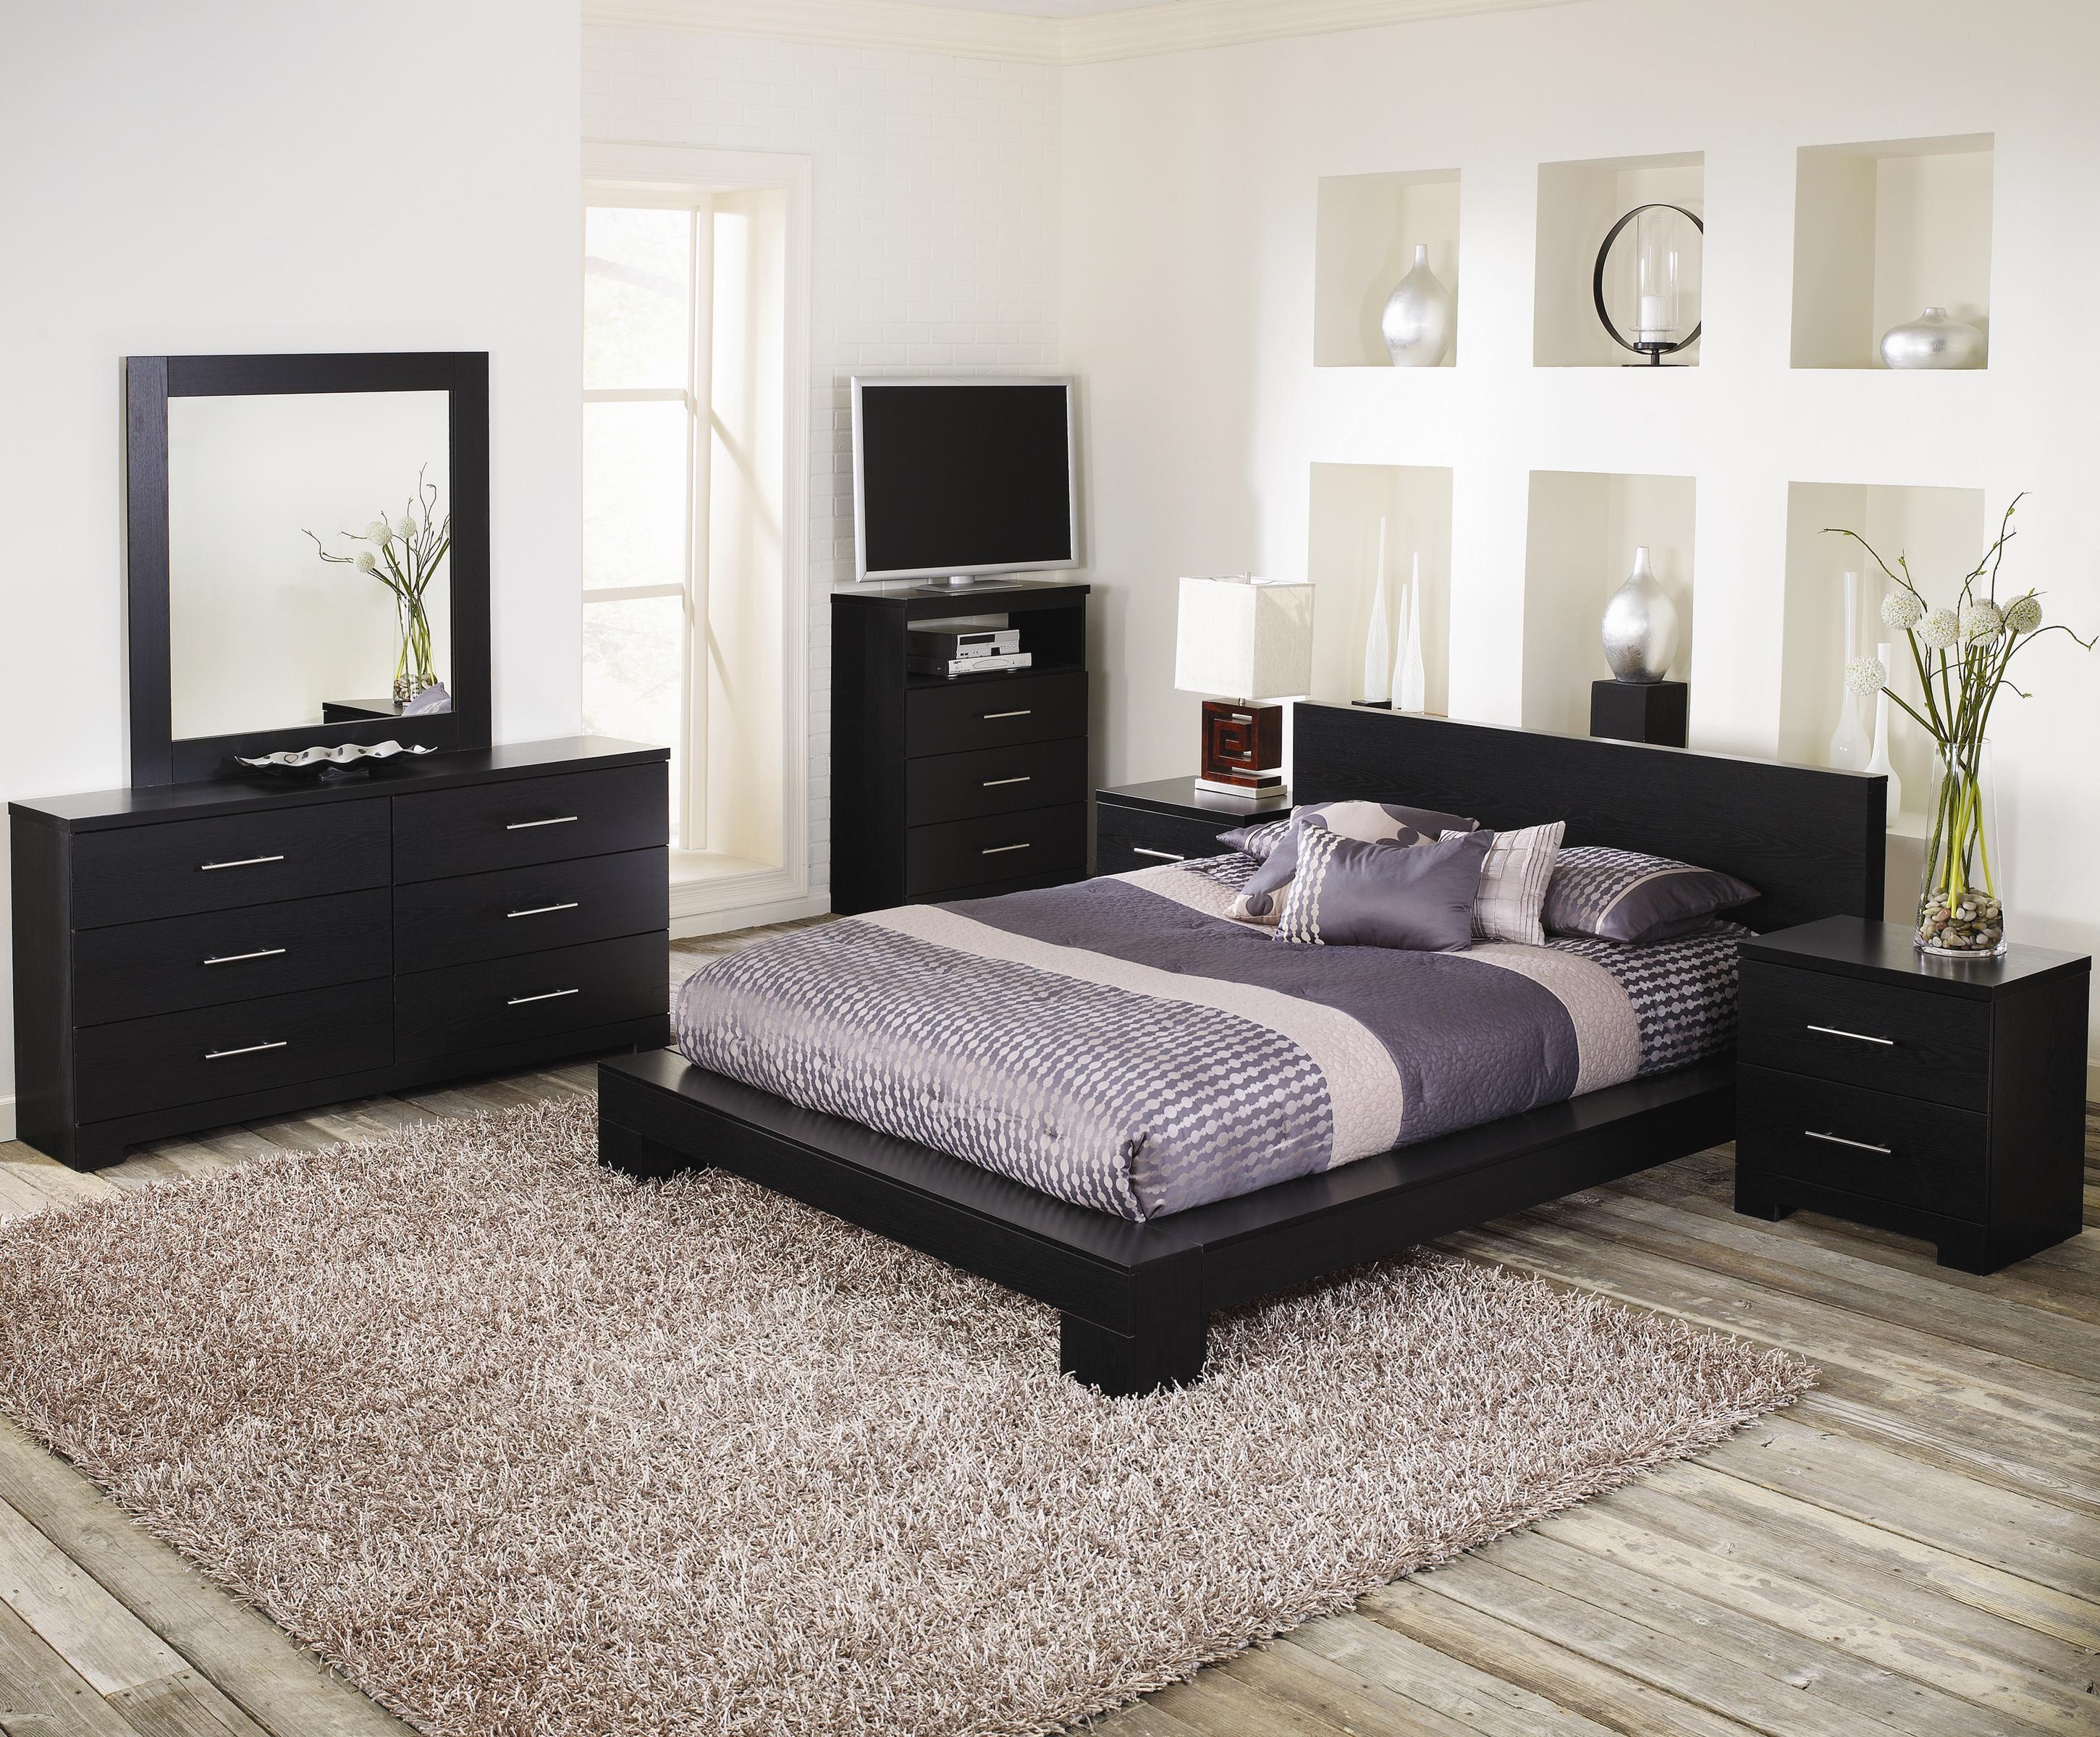 Lang Furniture Bedroom 3 Drawer Media Console BRO 11 333MC ...